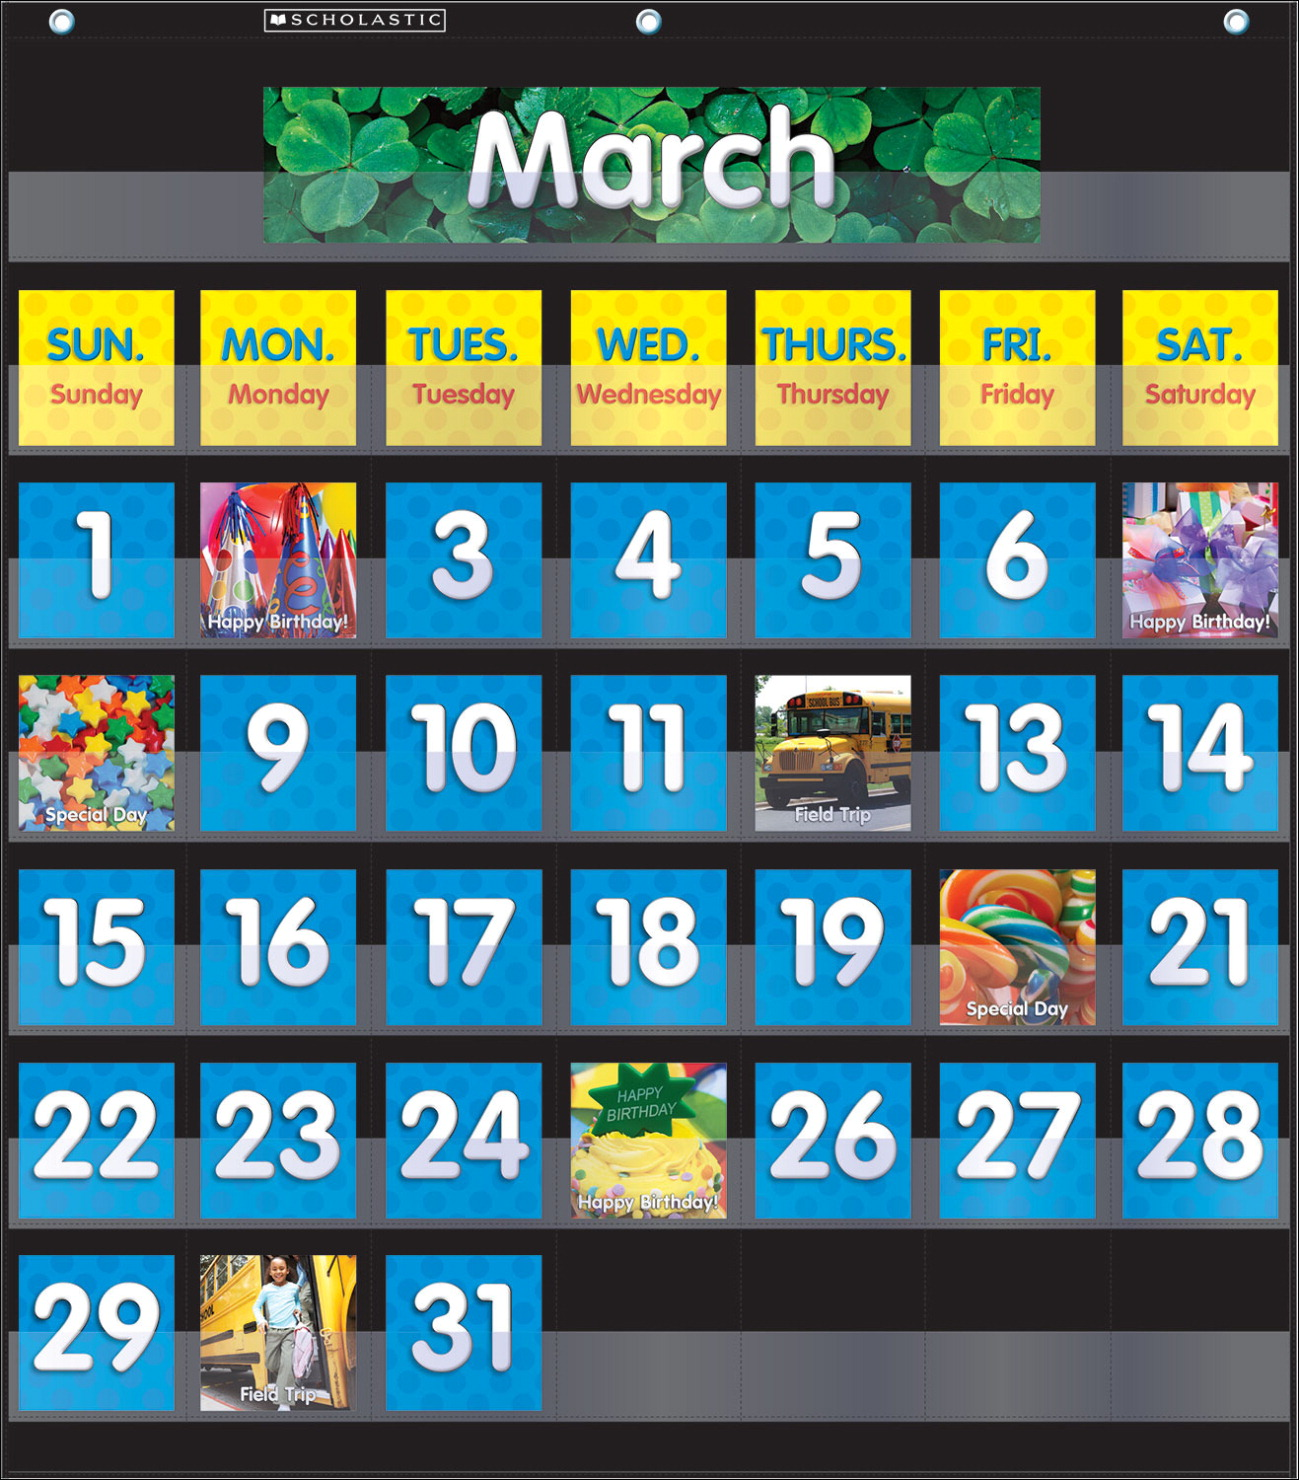 Scholastic monthly calendar pocket chart black school specialty